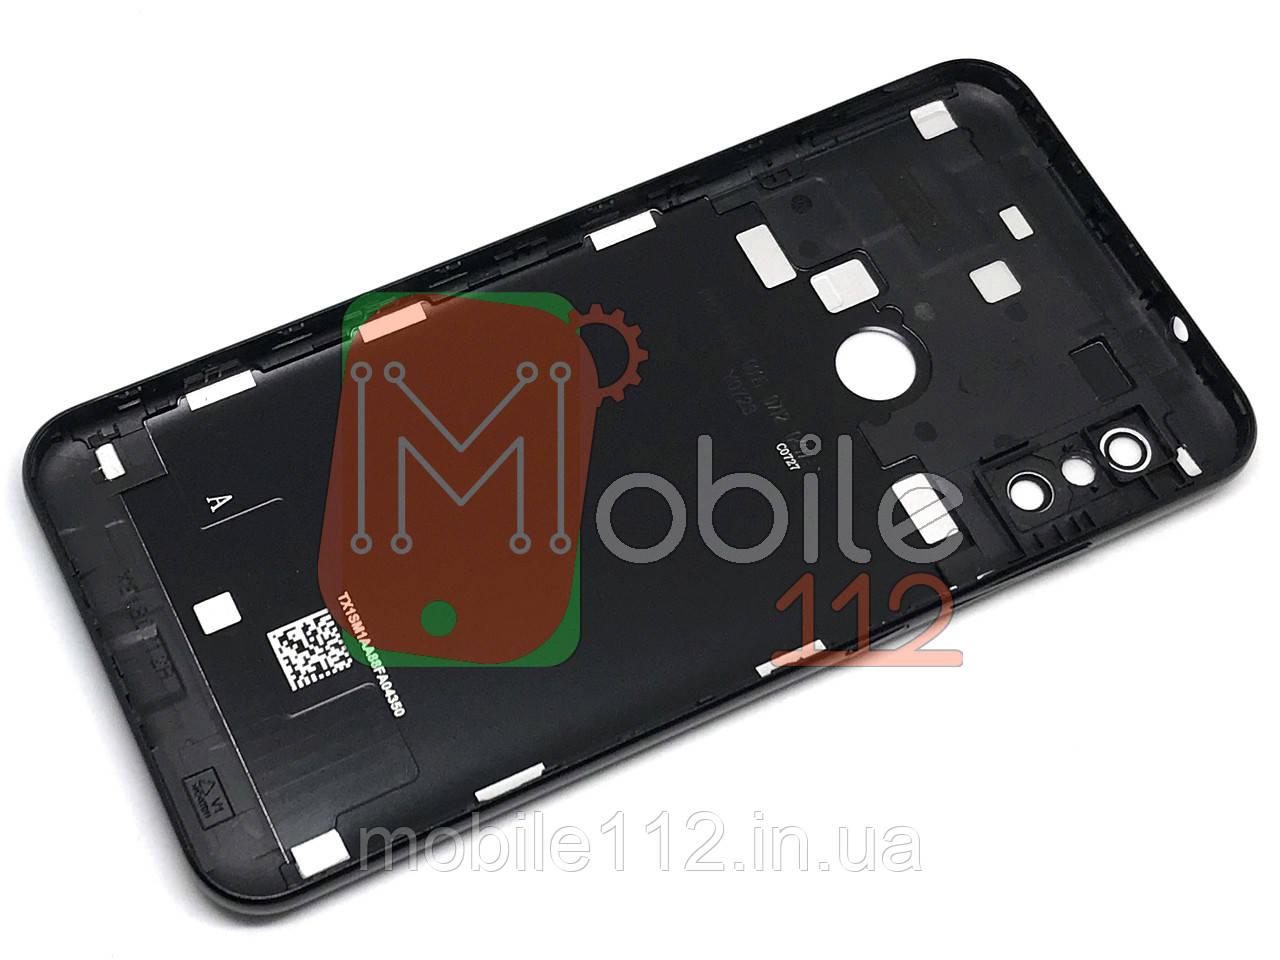 Задняя крышка Xiaomi Mi A2 Lite, Redmi 6 Pro M1805D1SG черная